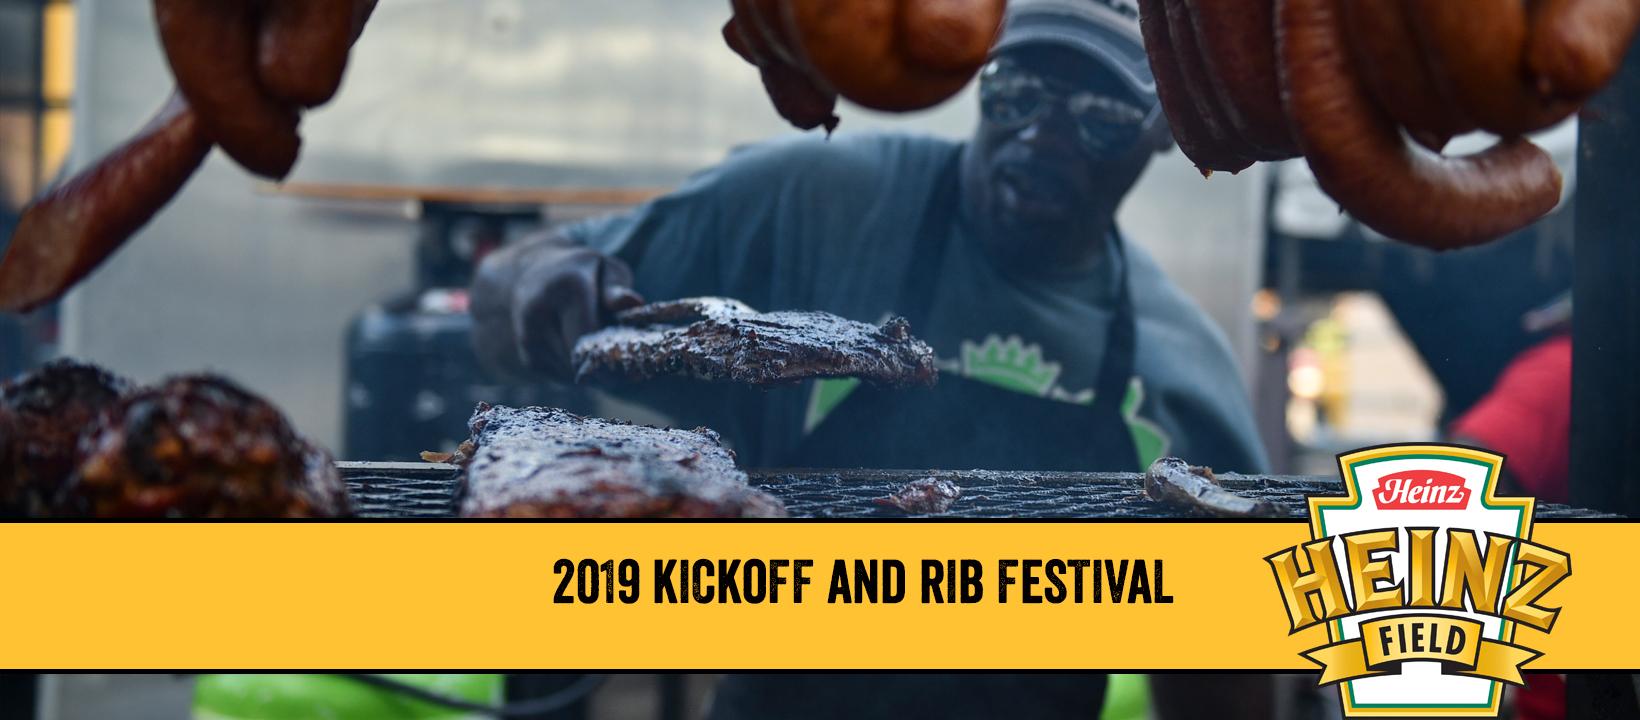 Heinz Field Kickoff And Rib Fest At Heinz Field Starting August 29